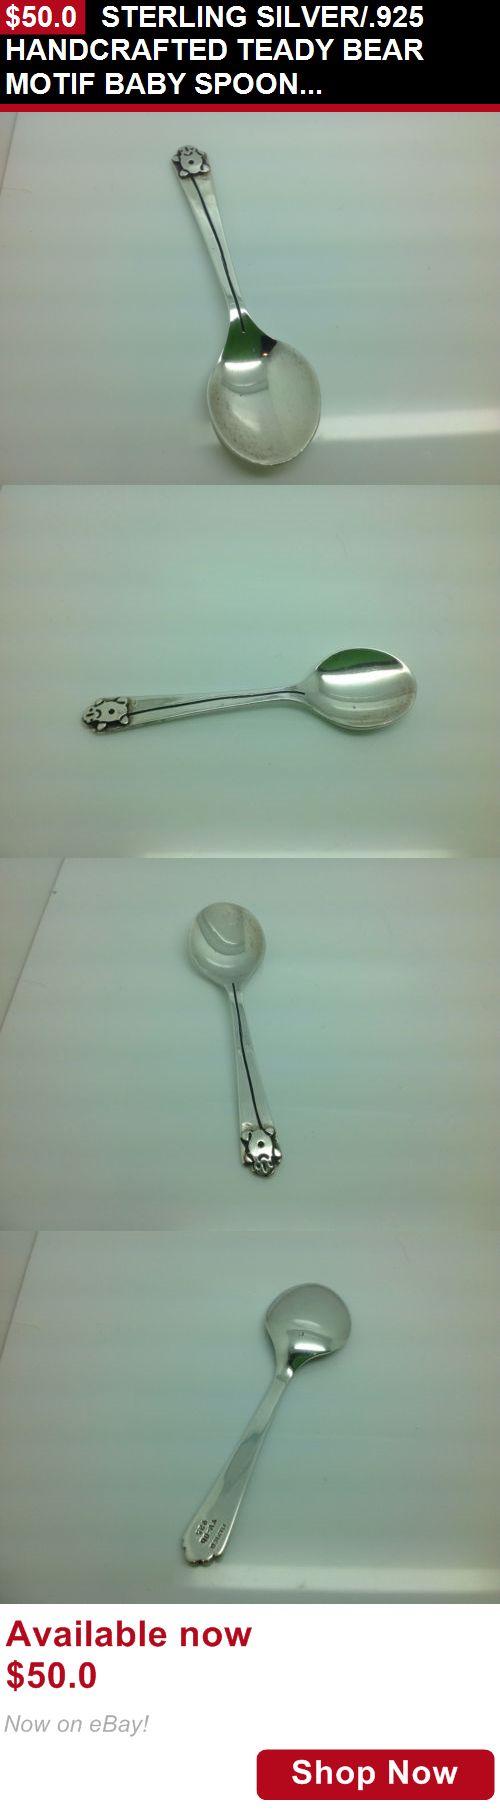 Baby Utensils: Sterling Silver/.925 Handcrafted Teady Bear Motif Baby Spoon-Keepsake BUY IT NOW ONLY: $50.0